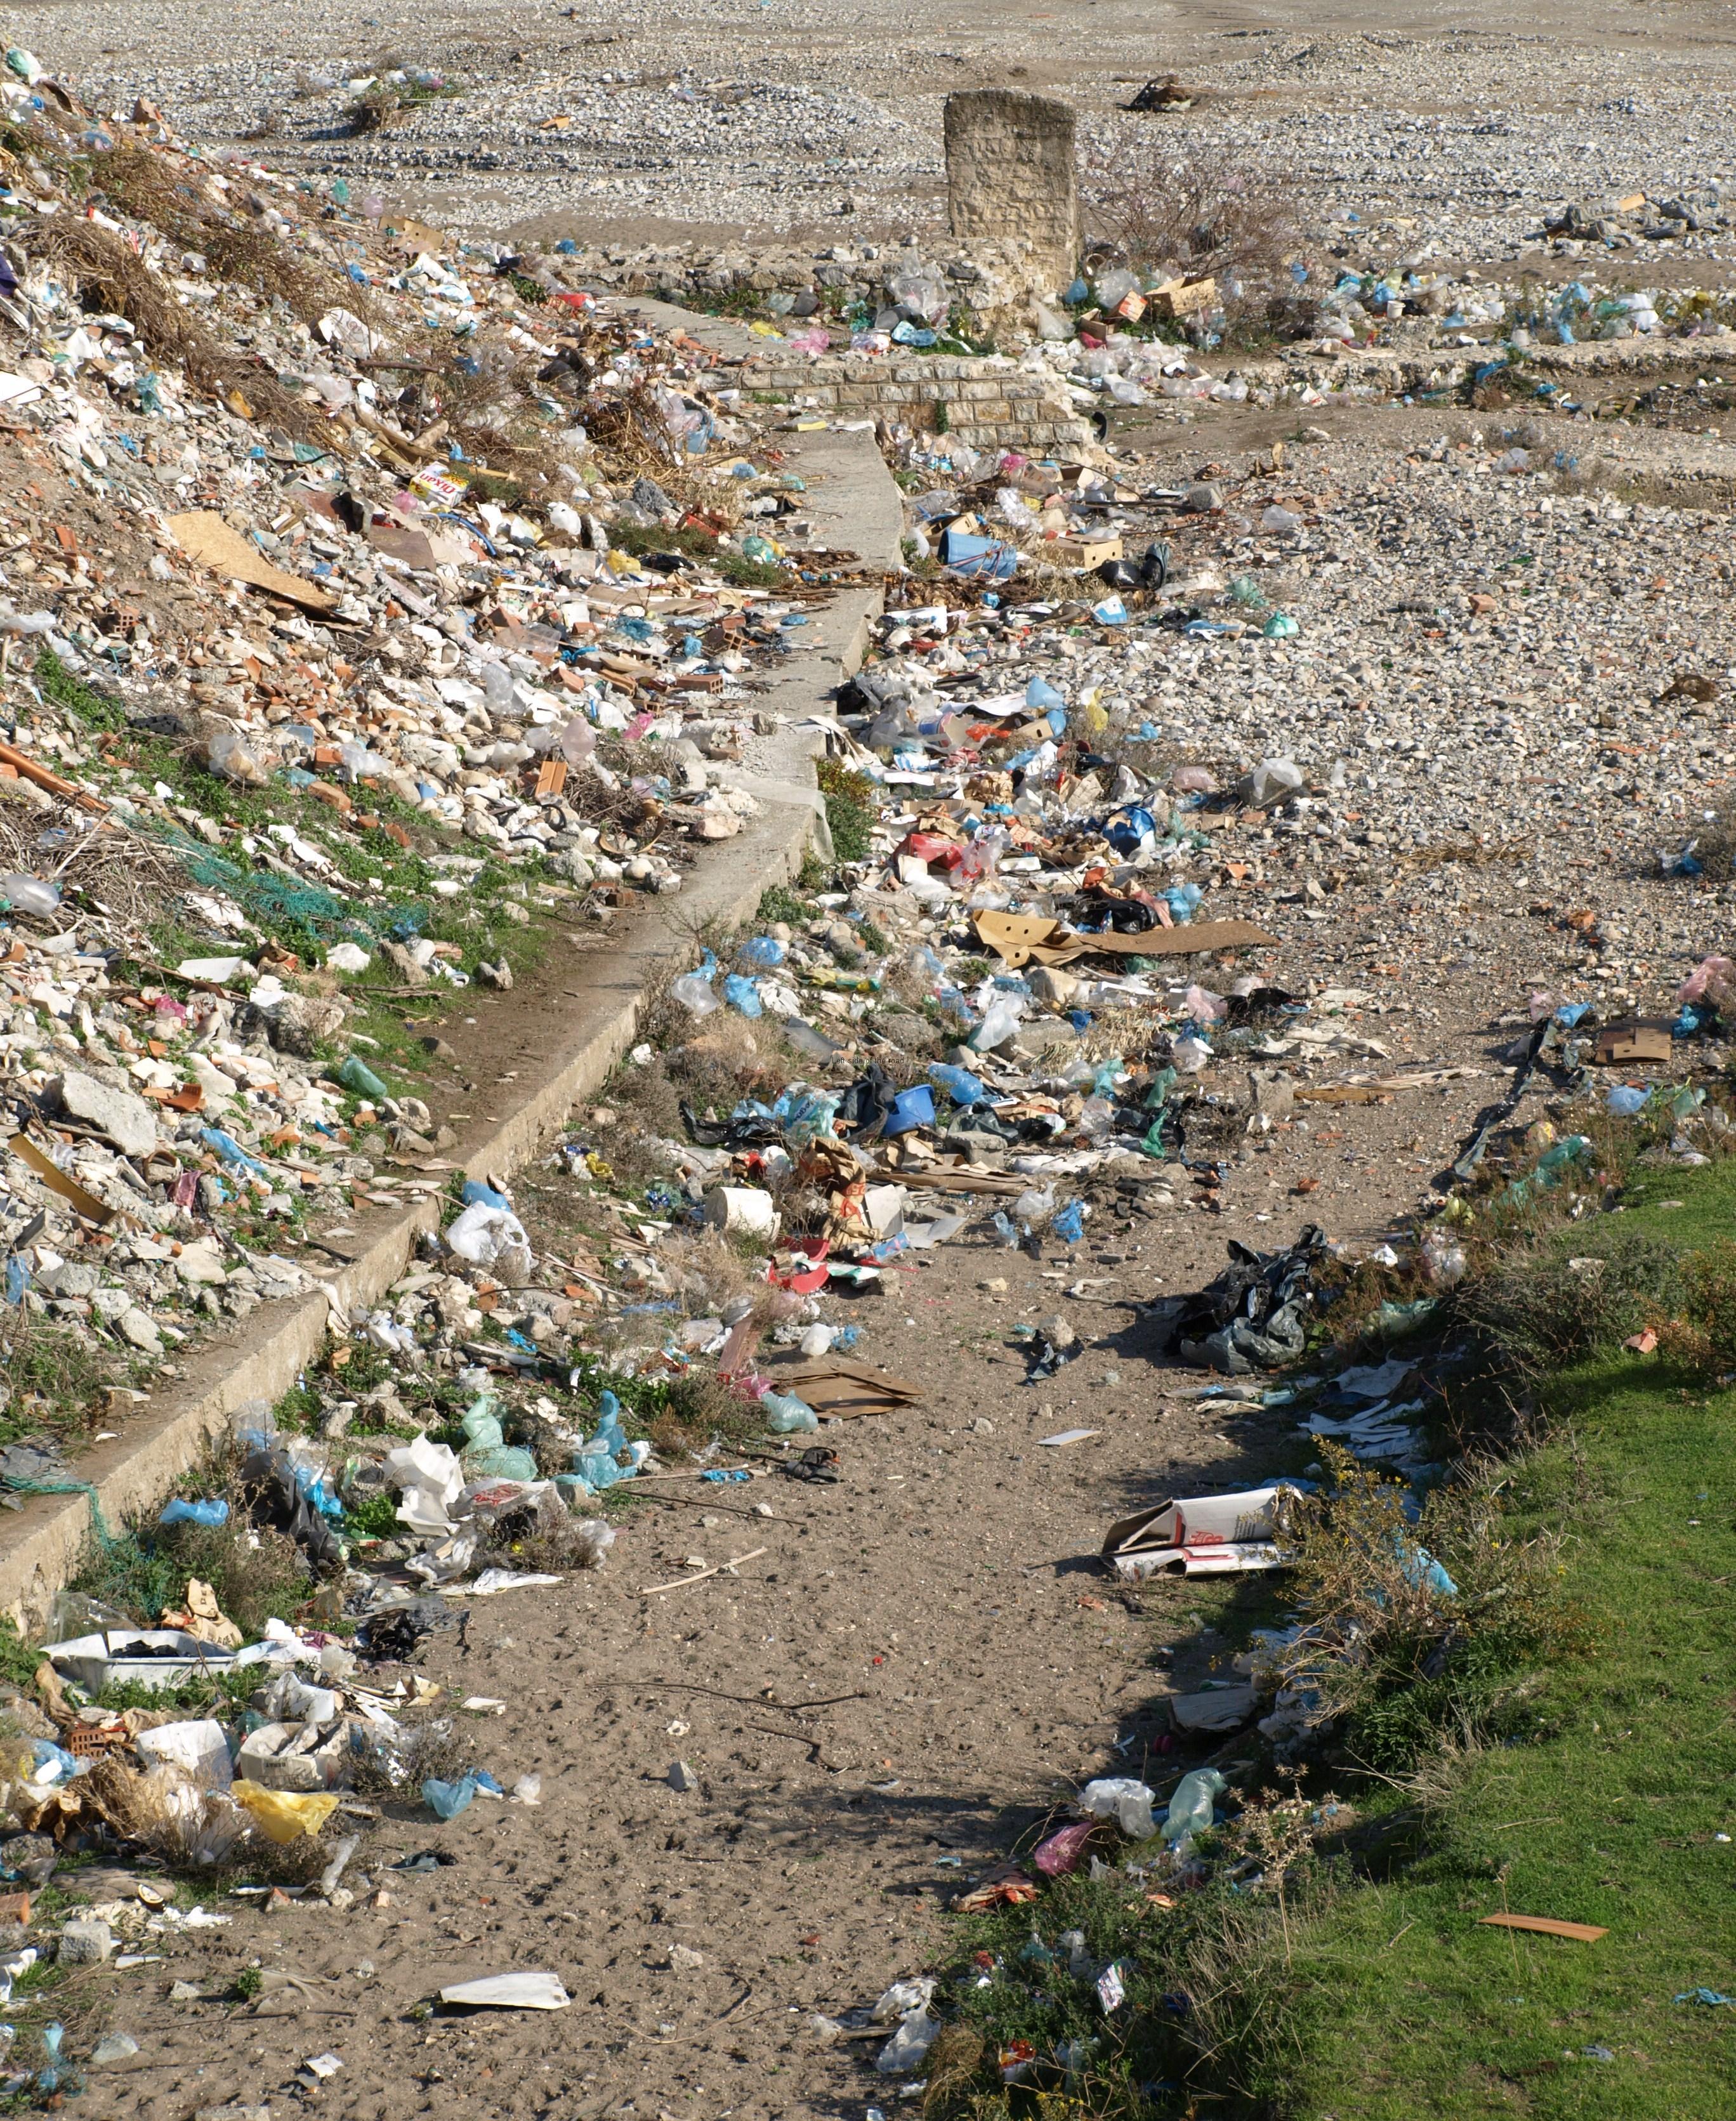 Rubbish in Kir River